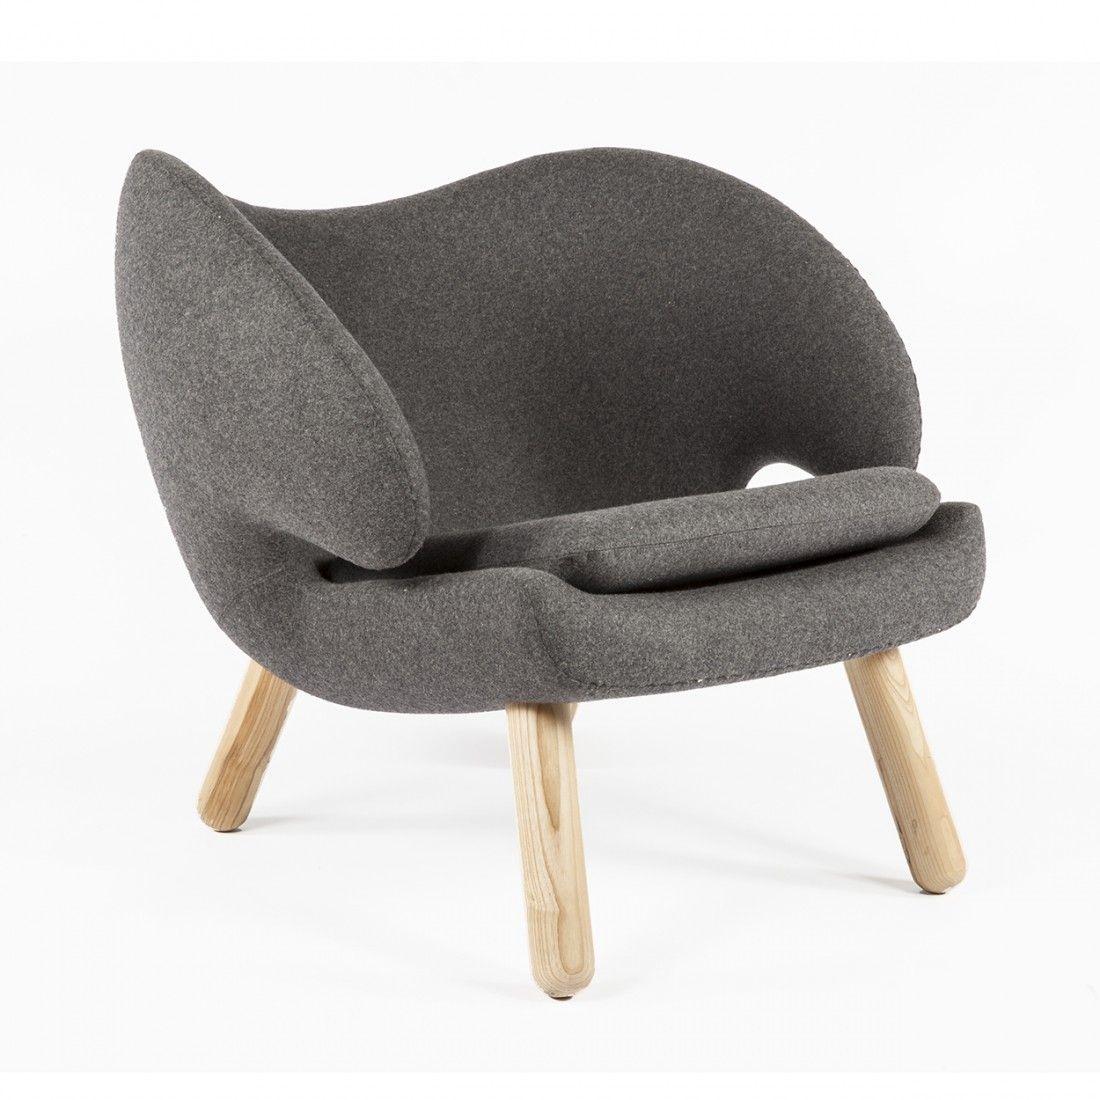 Mid Century Replica Finn Juhl Replica Pelican Lounge Chair   Charcoal Grey  Wool